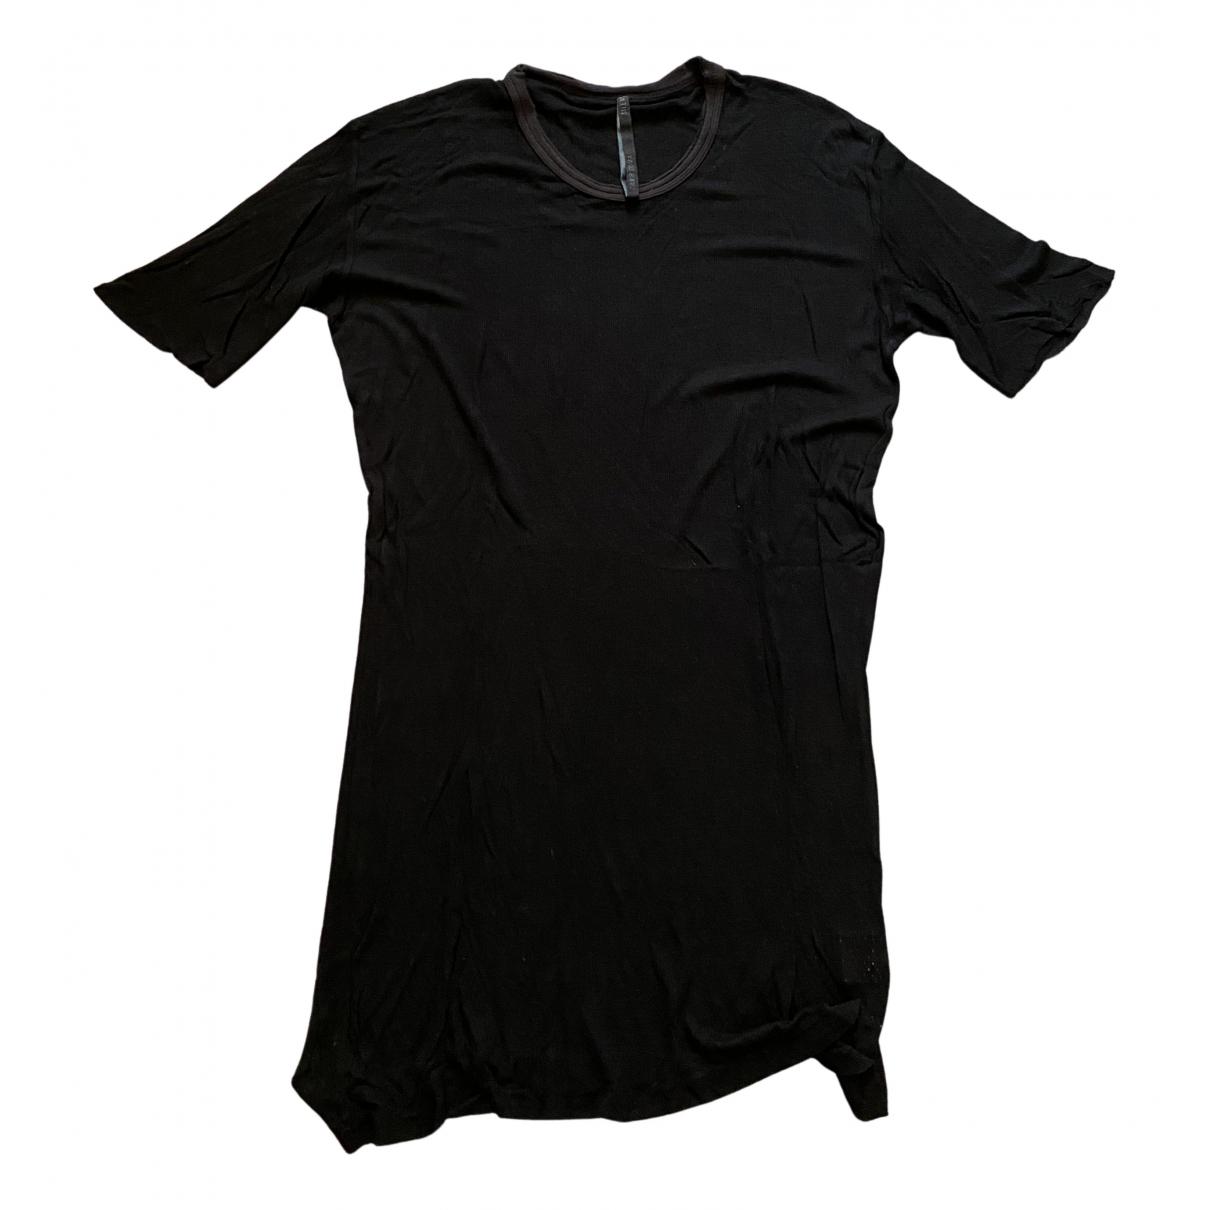 Damir Doma - Tee shirts   pour homme - noir